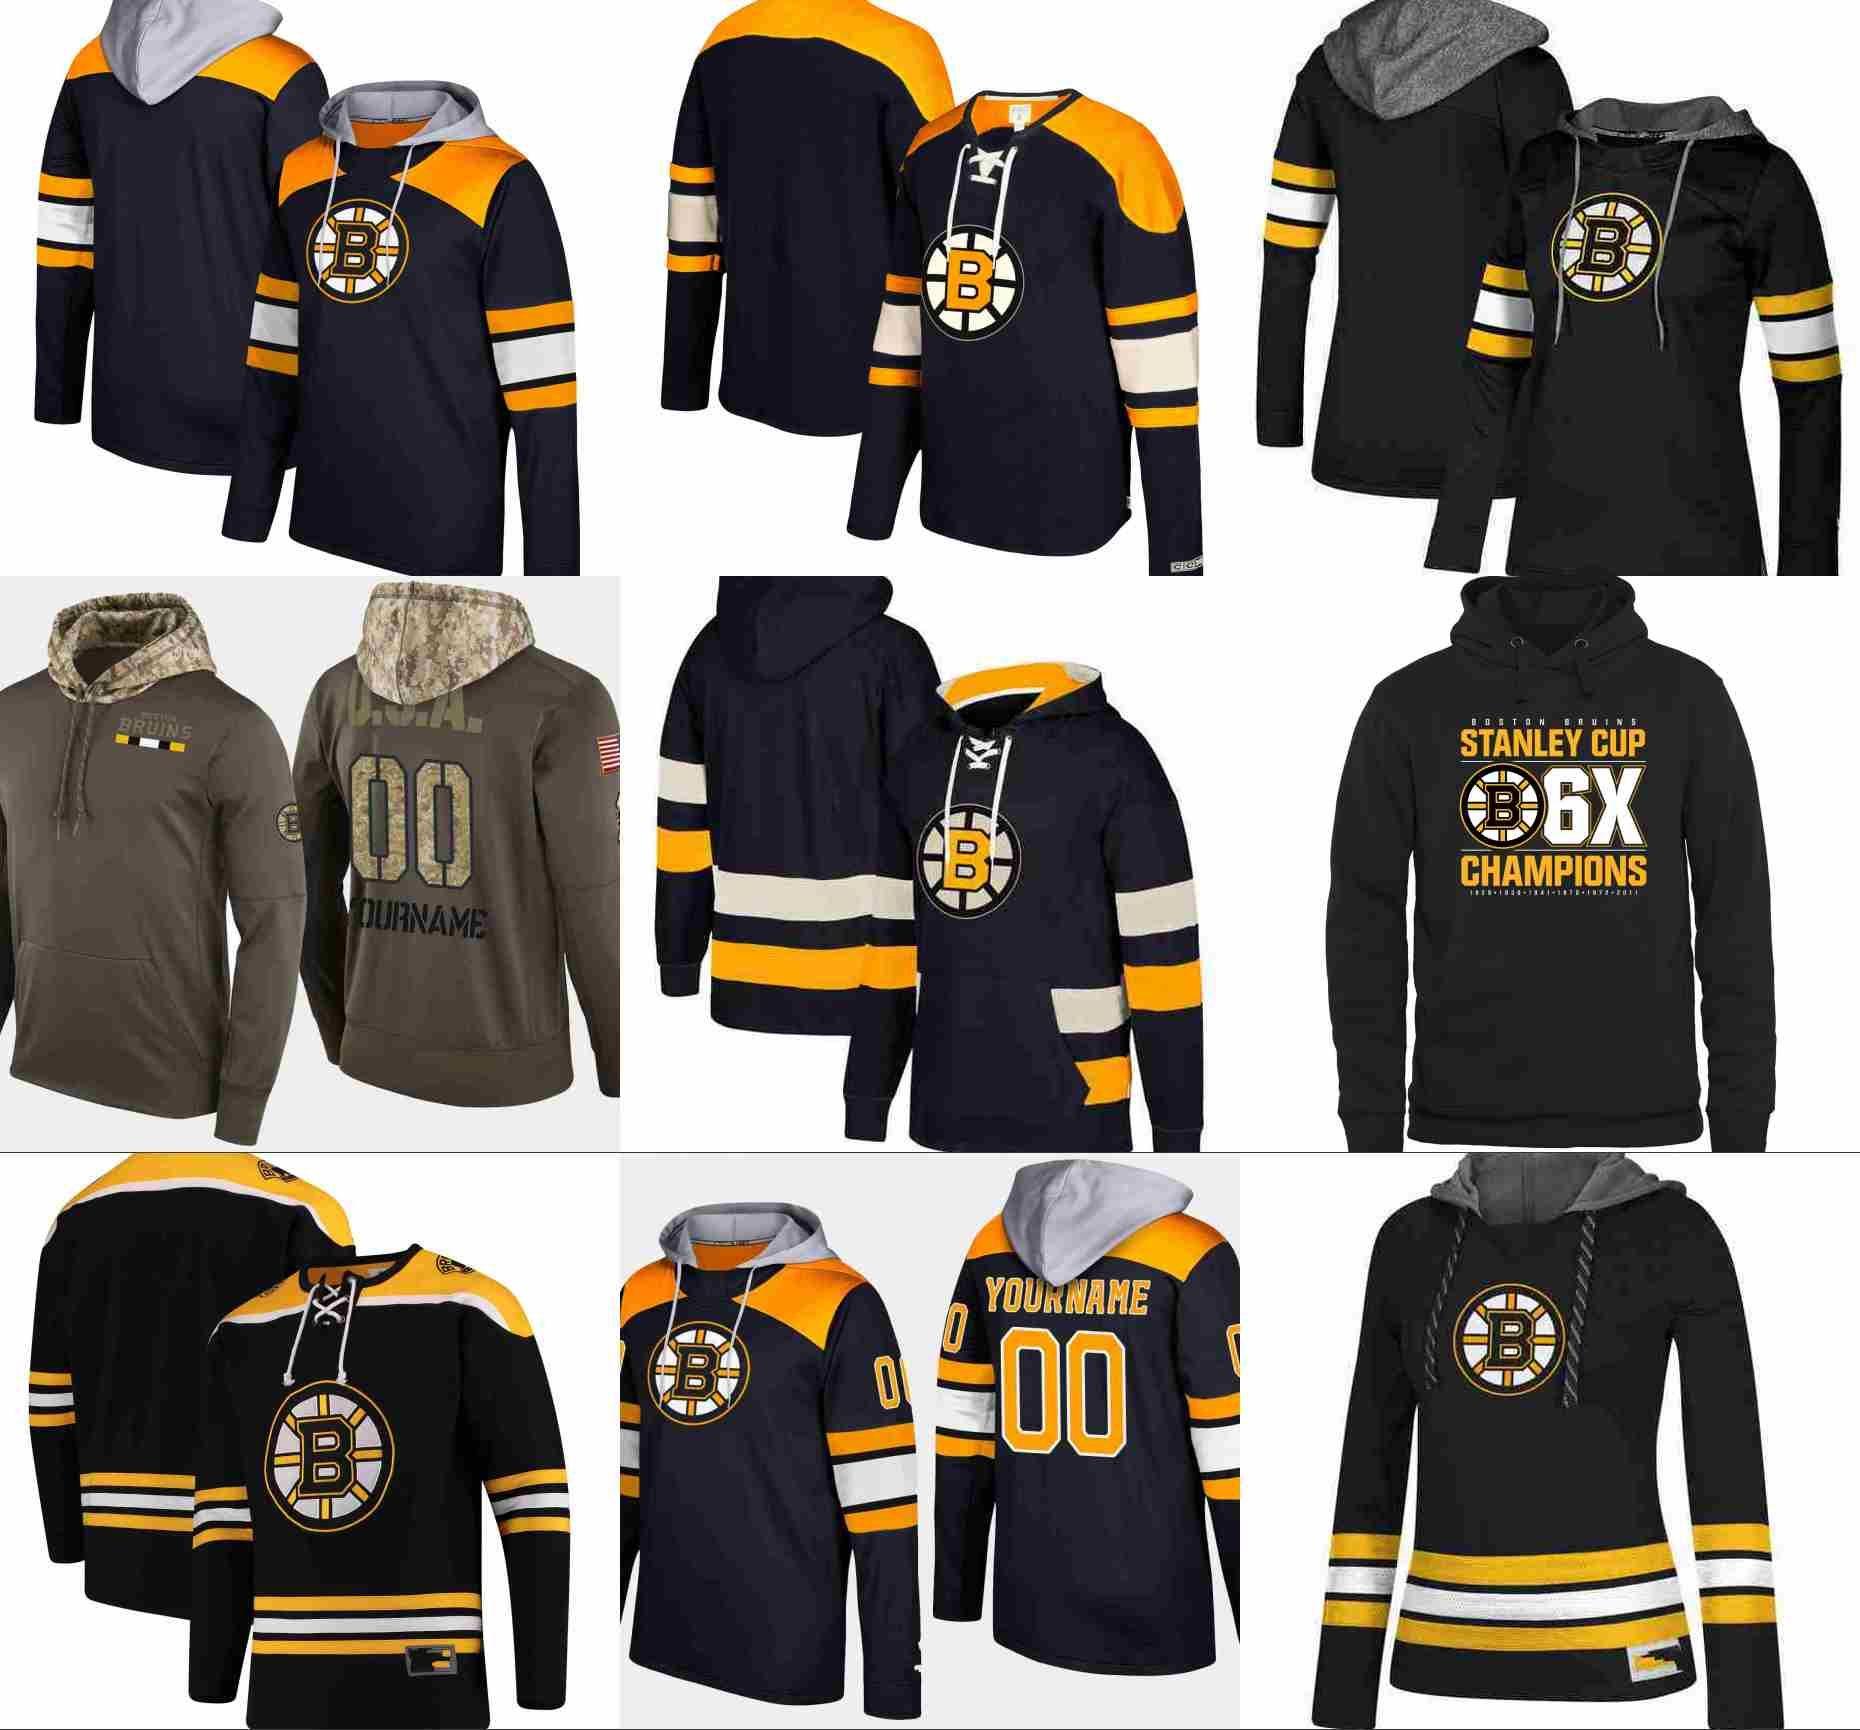 hot sale online 933d6 c1887 Jersey Chara Rask Hockey Krug Tuukka Orr Torey Hoodies ...